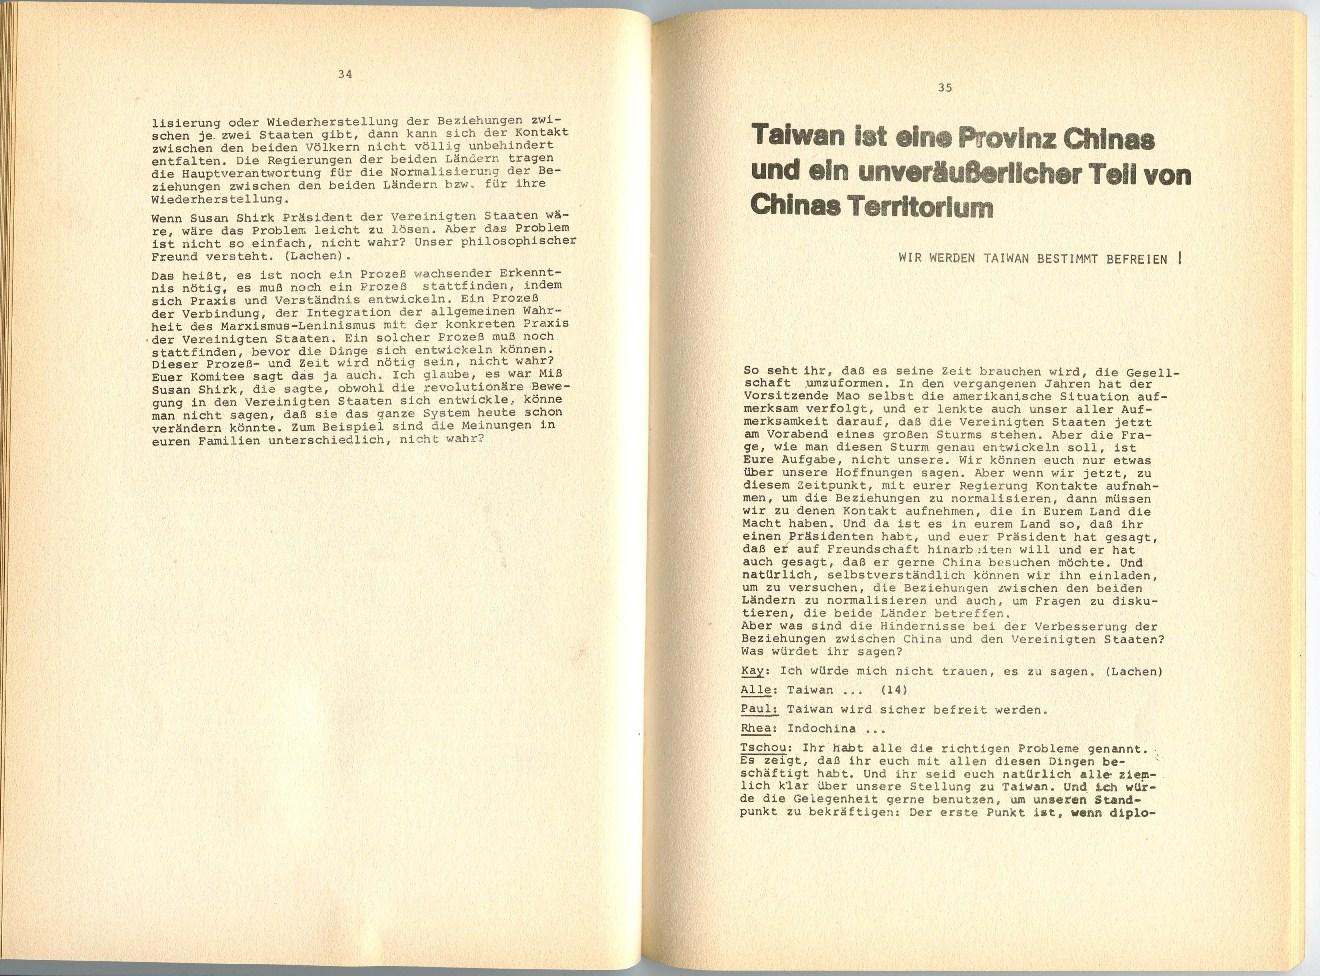 ZB_VRChina_Bollwerk_1971_19